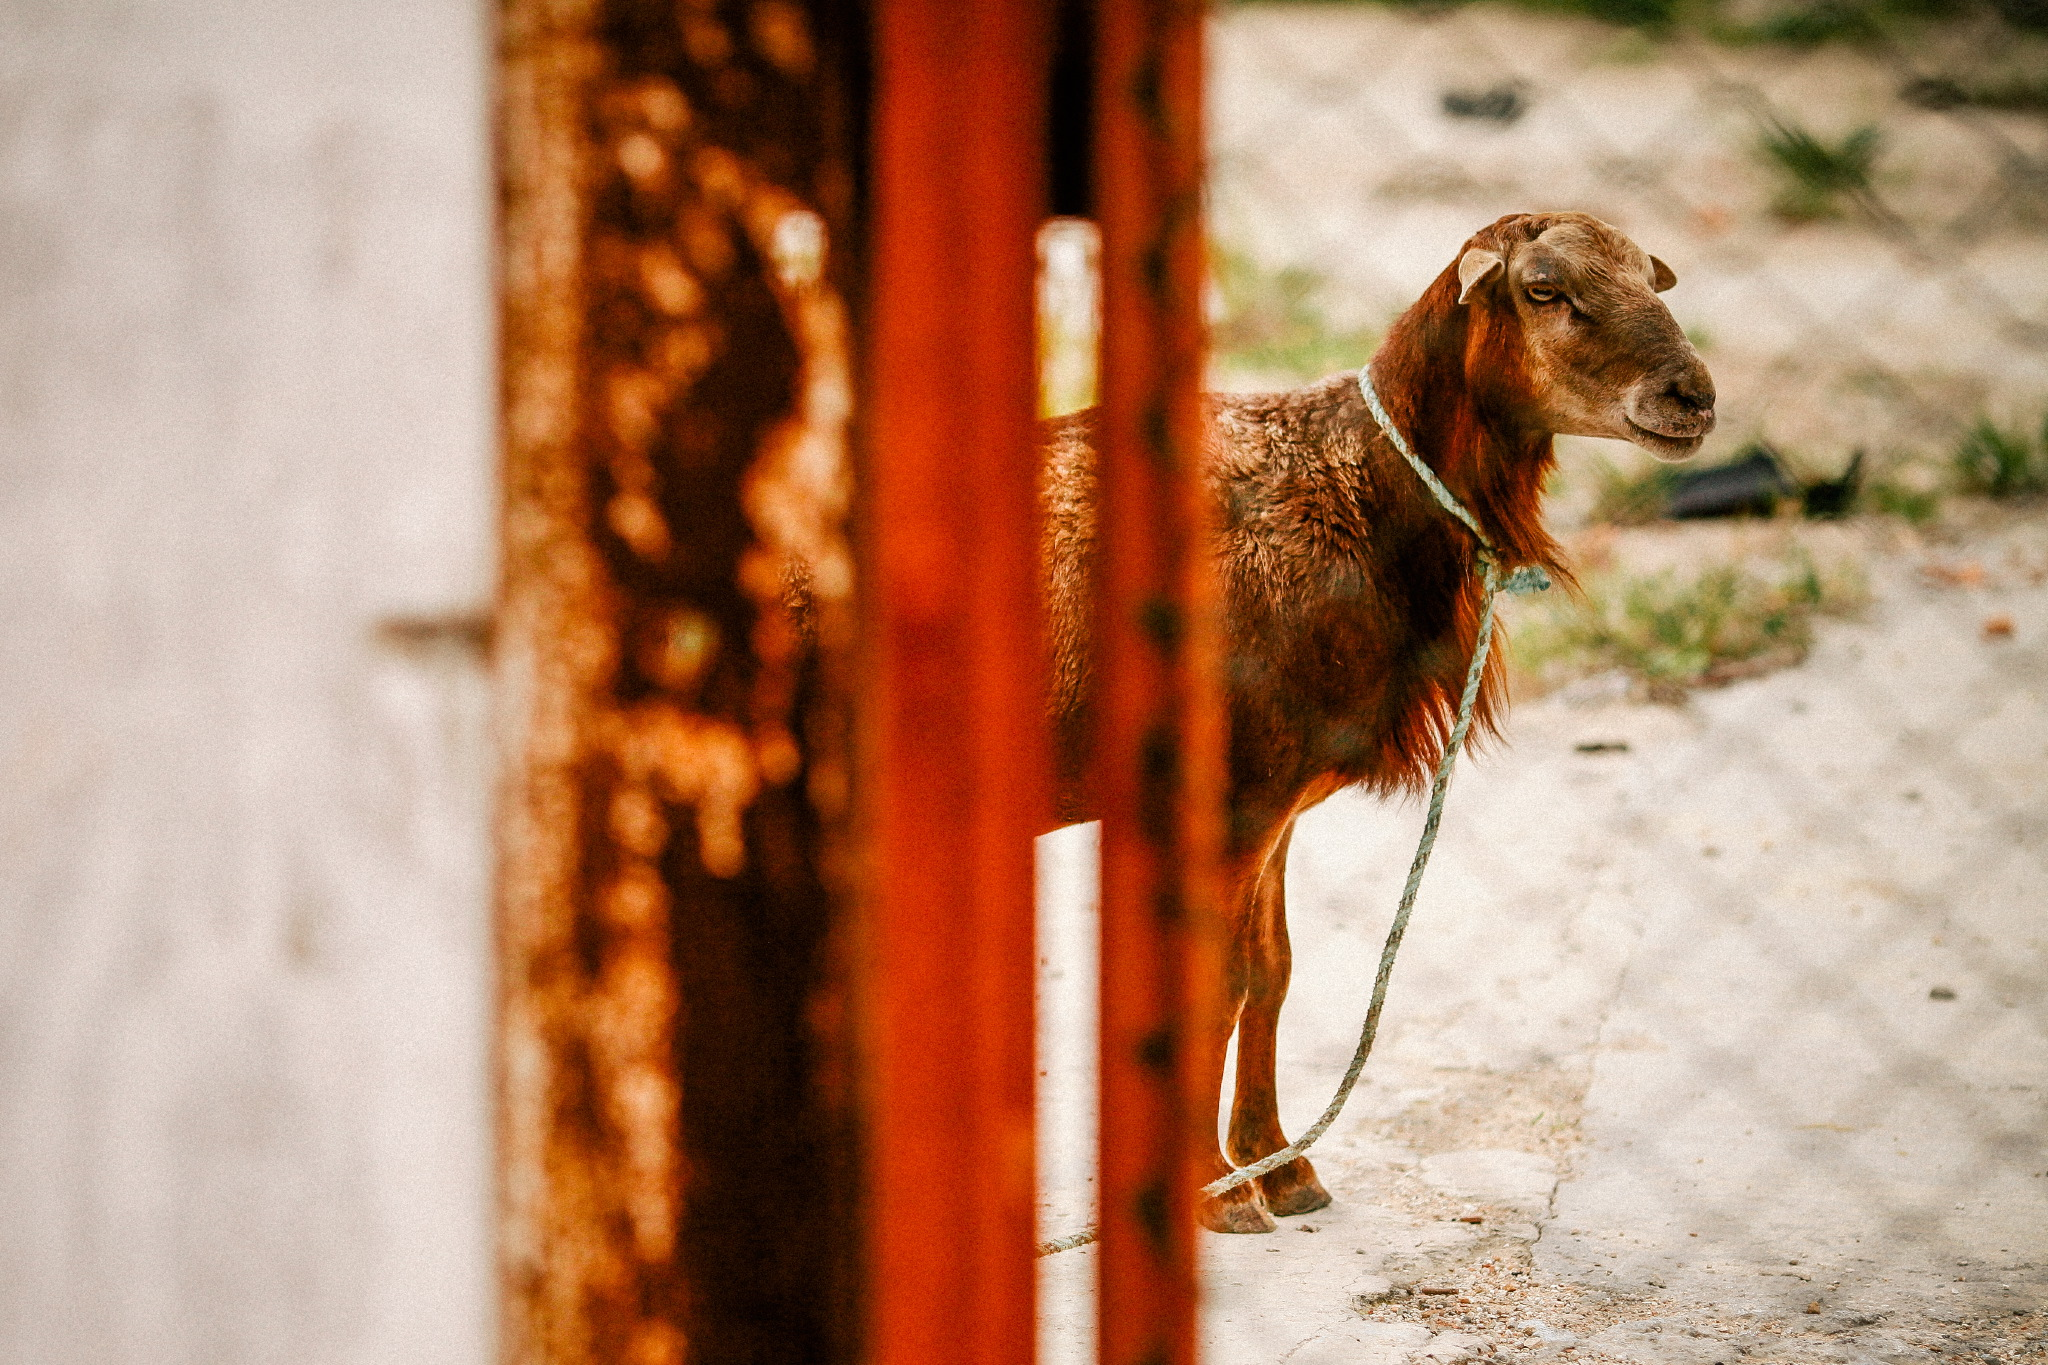 san diego wedding   photographer | goat with rope around neck